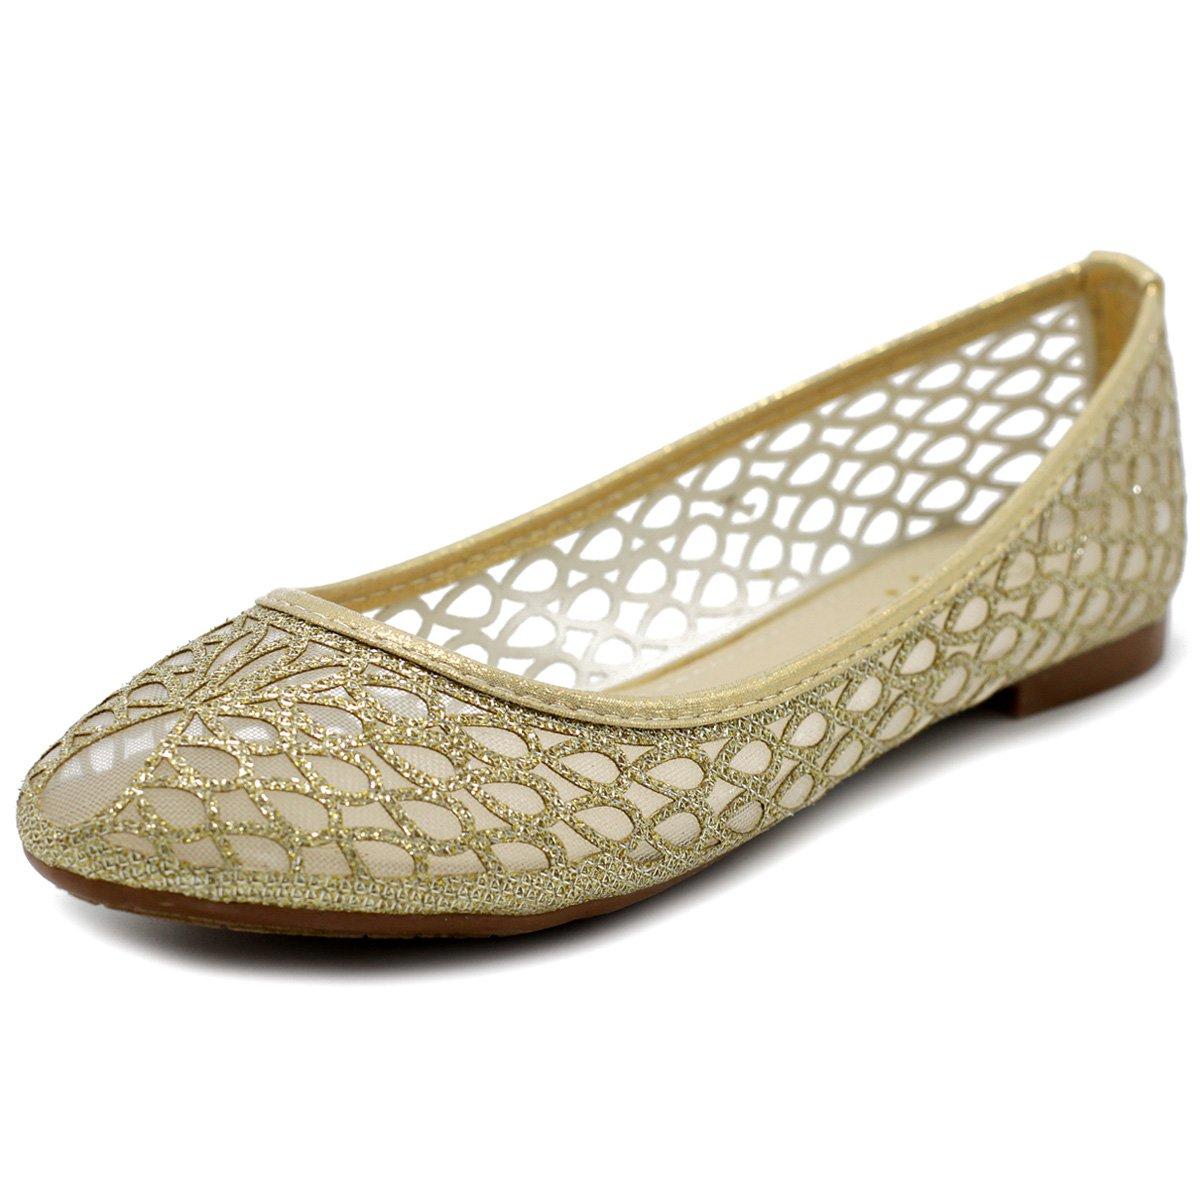 Ollio Women's Shoe Breathable Mesh Glitter Comfort Slip-on Ballet Flat 2 Styles BN10(9 B(M) US, Style2-Gold)